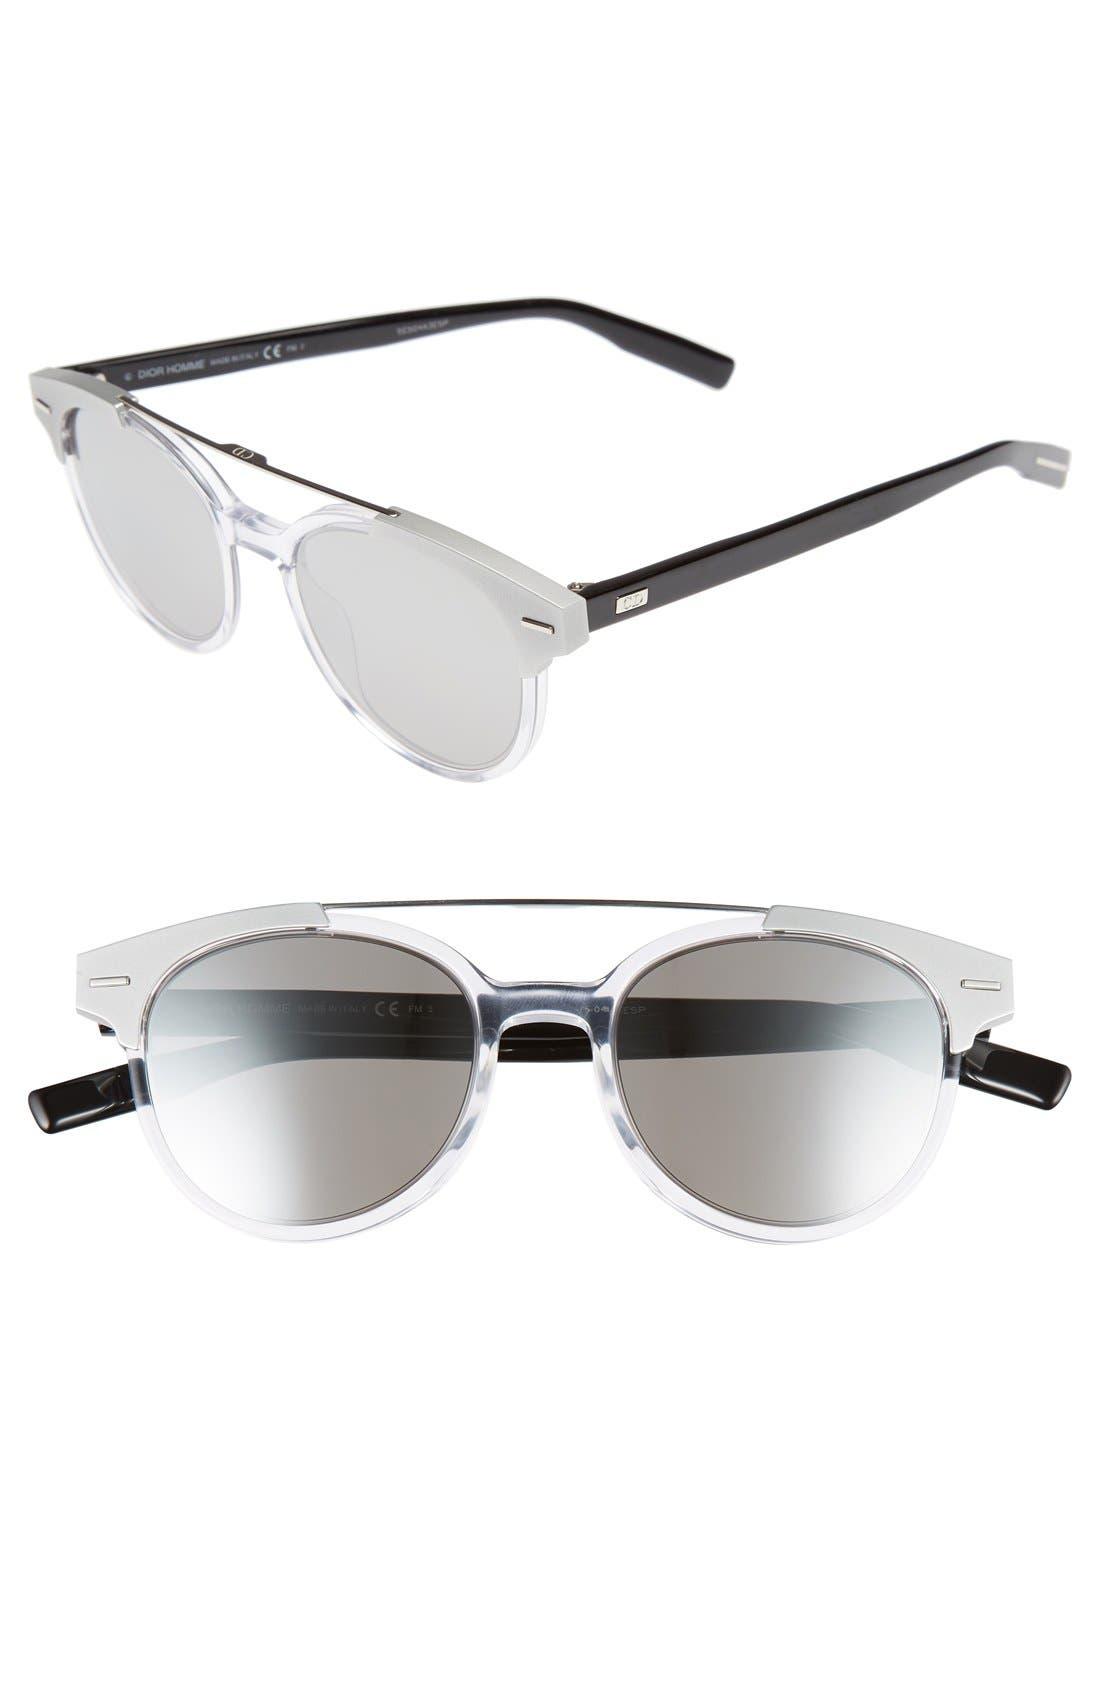 Dior 'Black Tie' 51mm Sunglasses,                         Main,                         color, Crystal Black